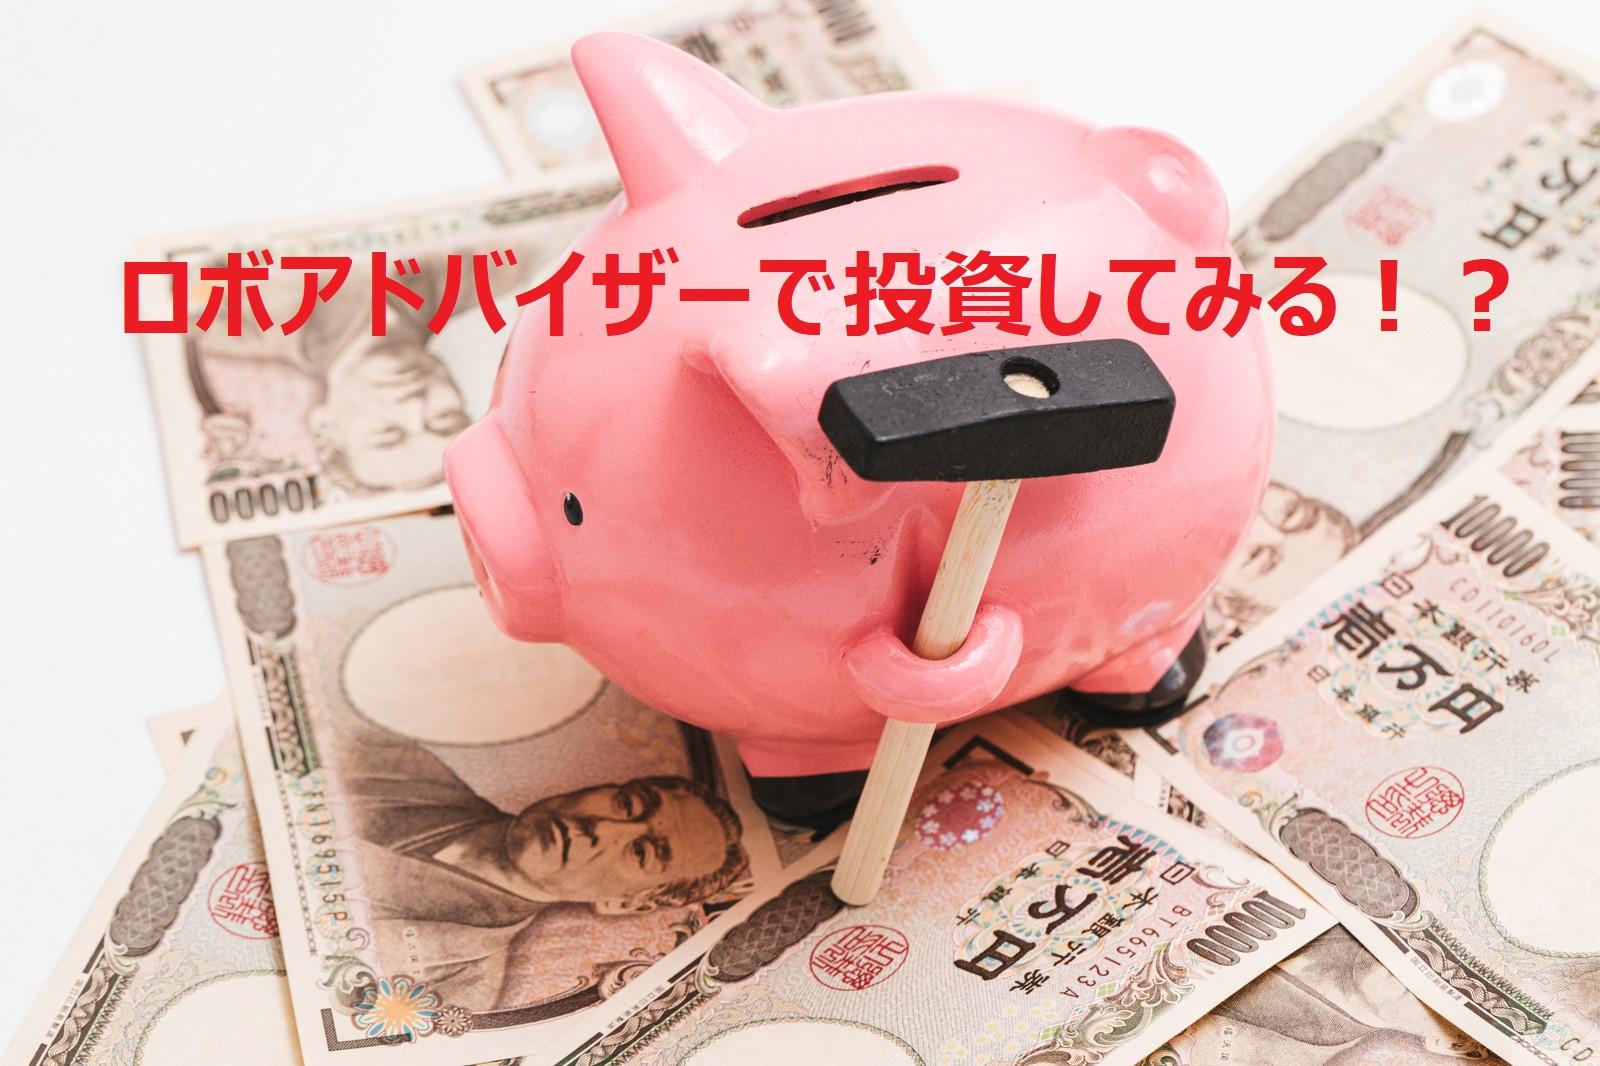 WealthNaviとは!? ロボアドバイザー WealthNavi で資産運用を1年。 イメージ画像